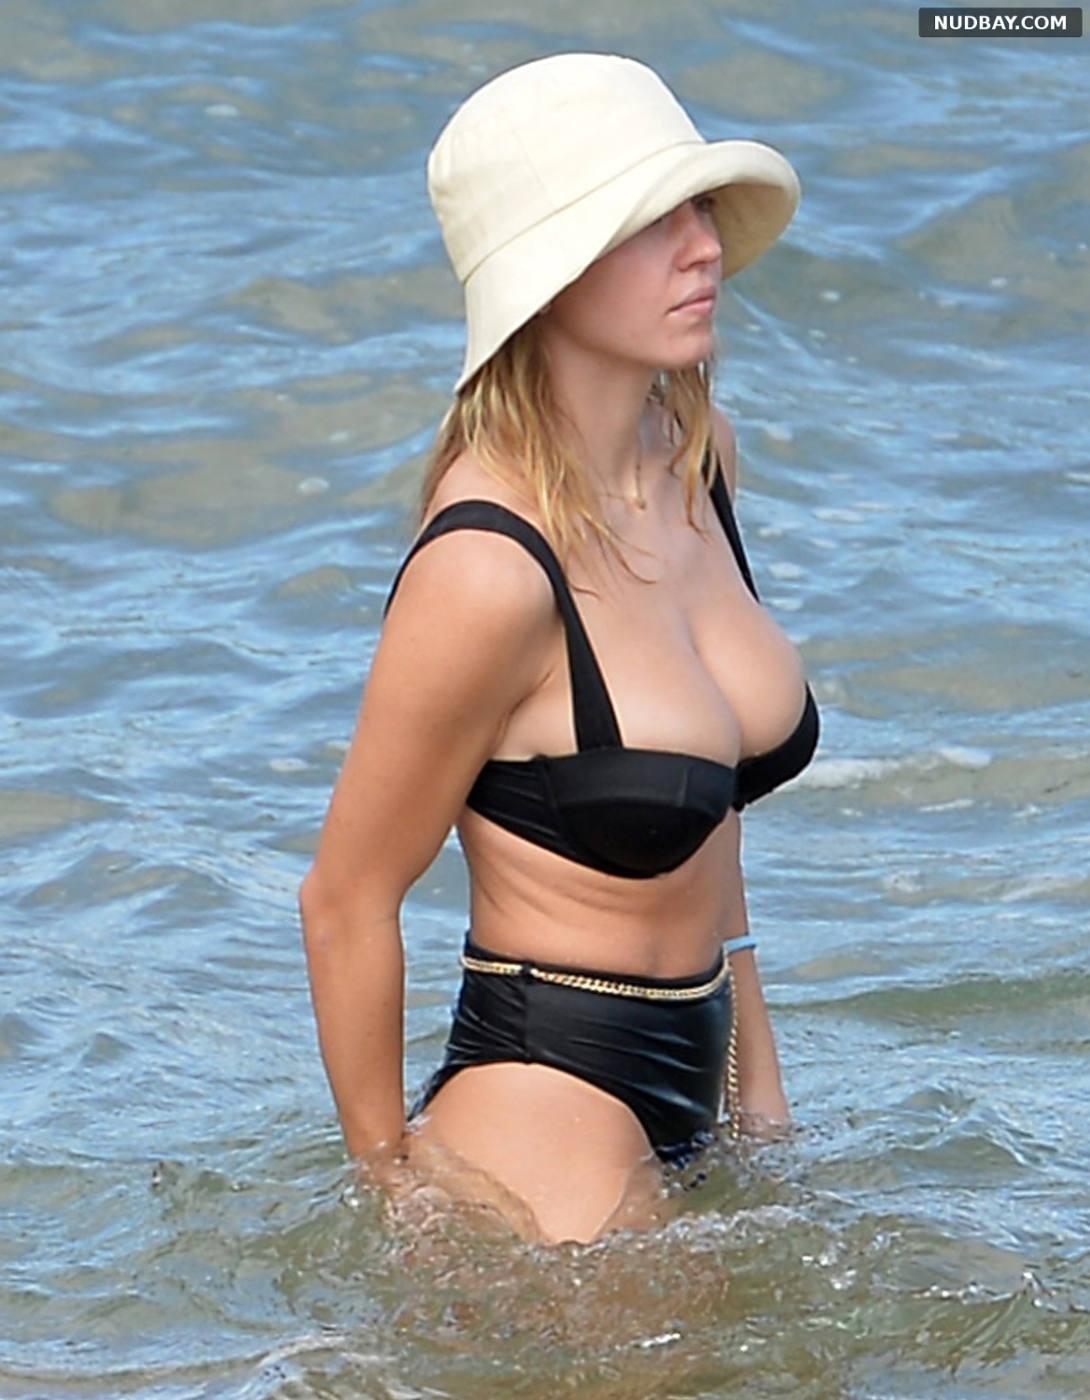 Sydney Sweeney on the beach in Maui Hawaii Nov 24 2020